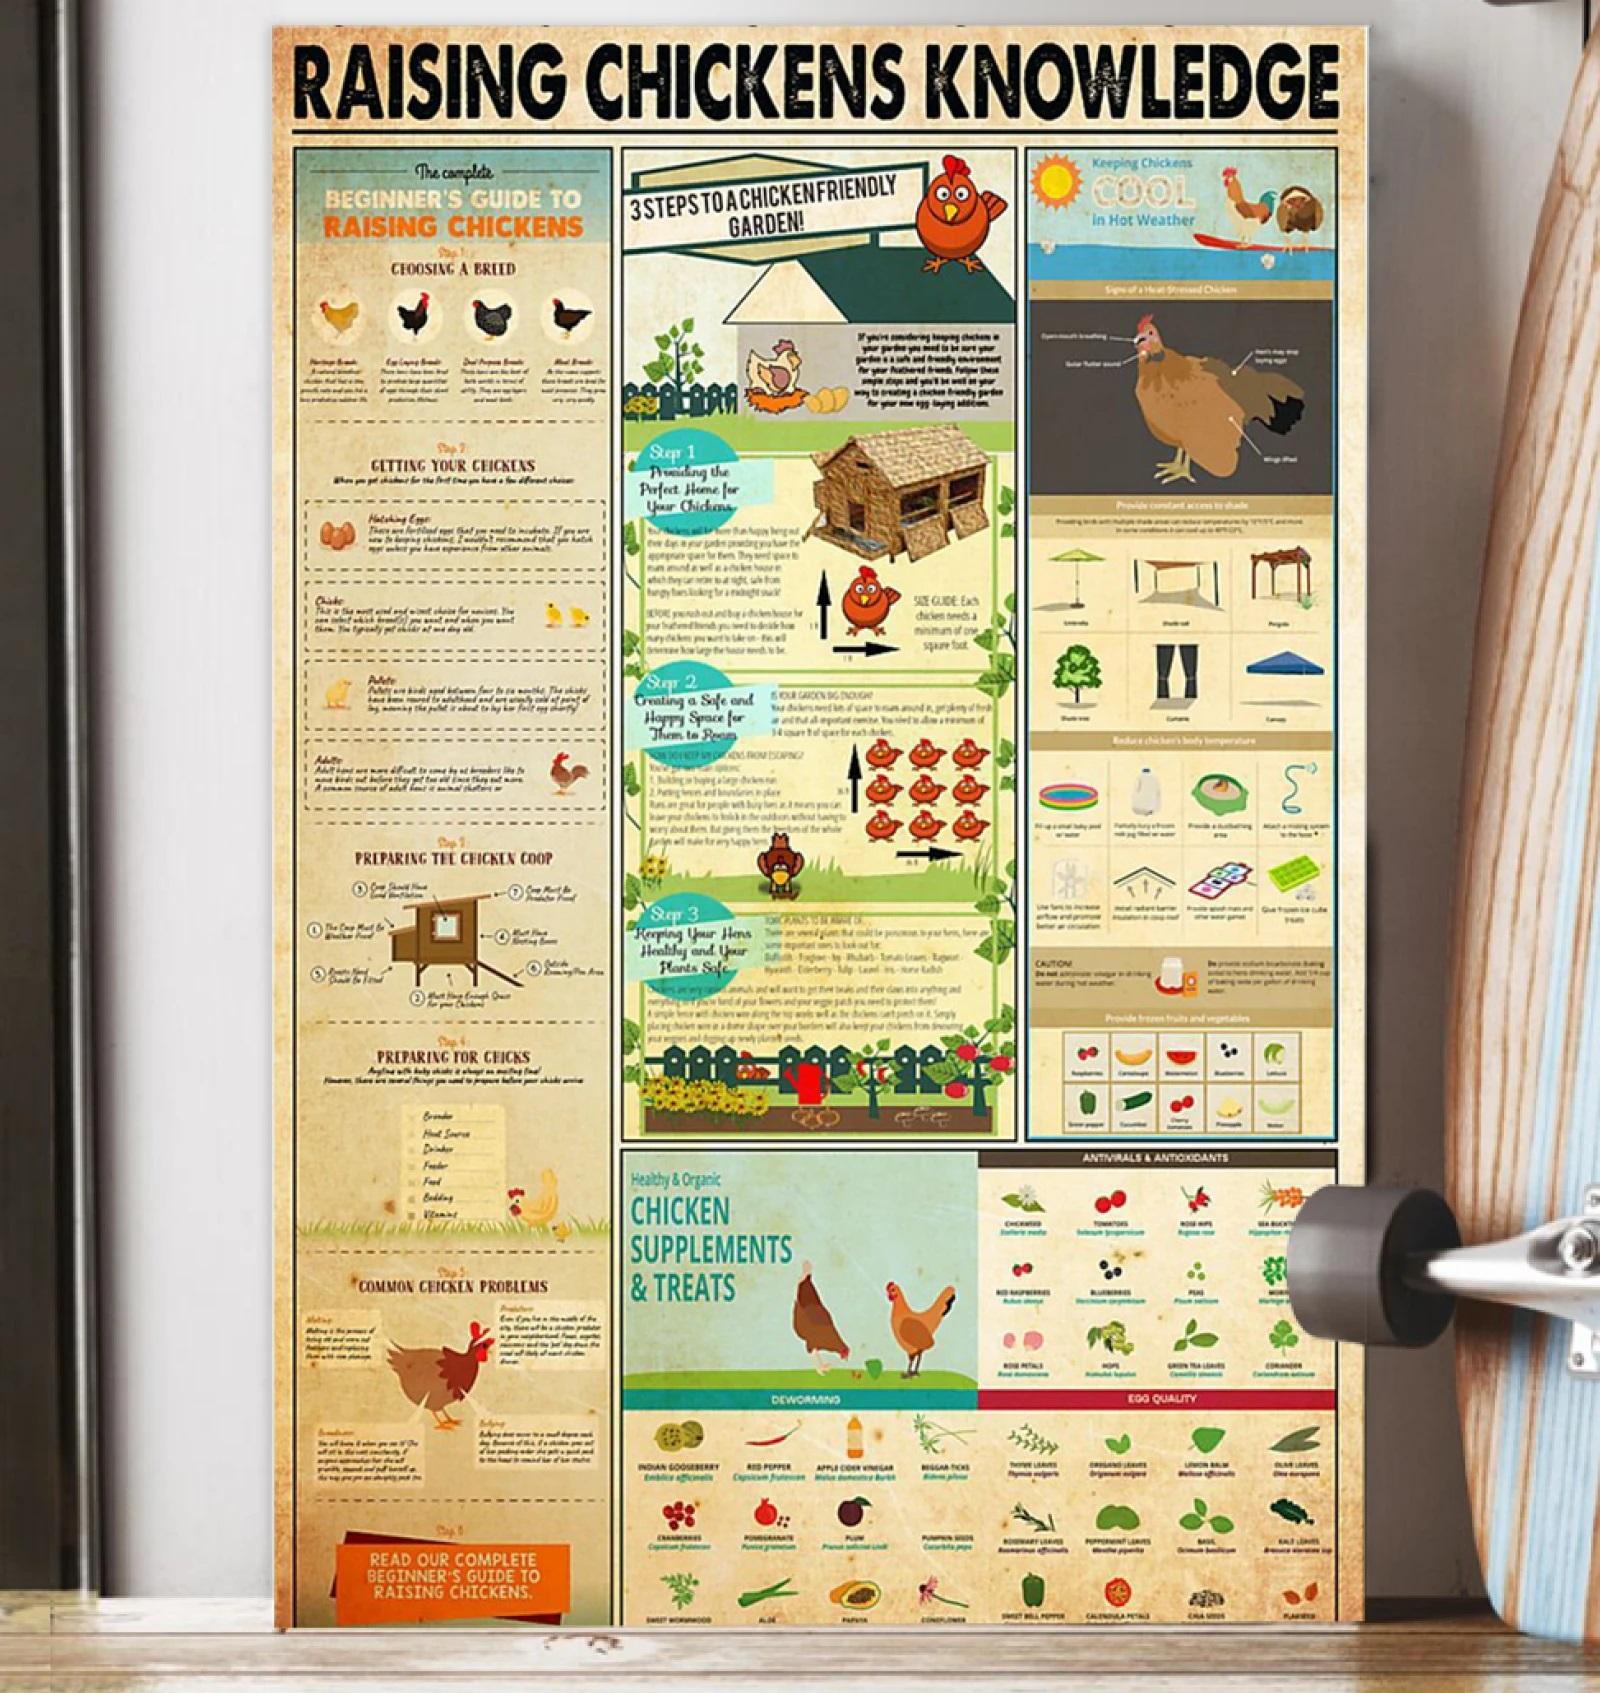 Raising Chickens Knowledge Poster - tml